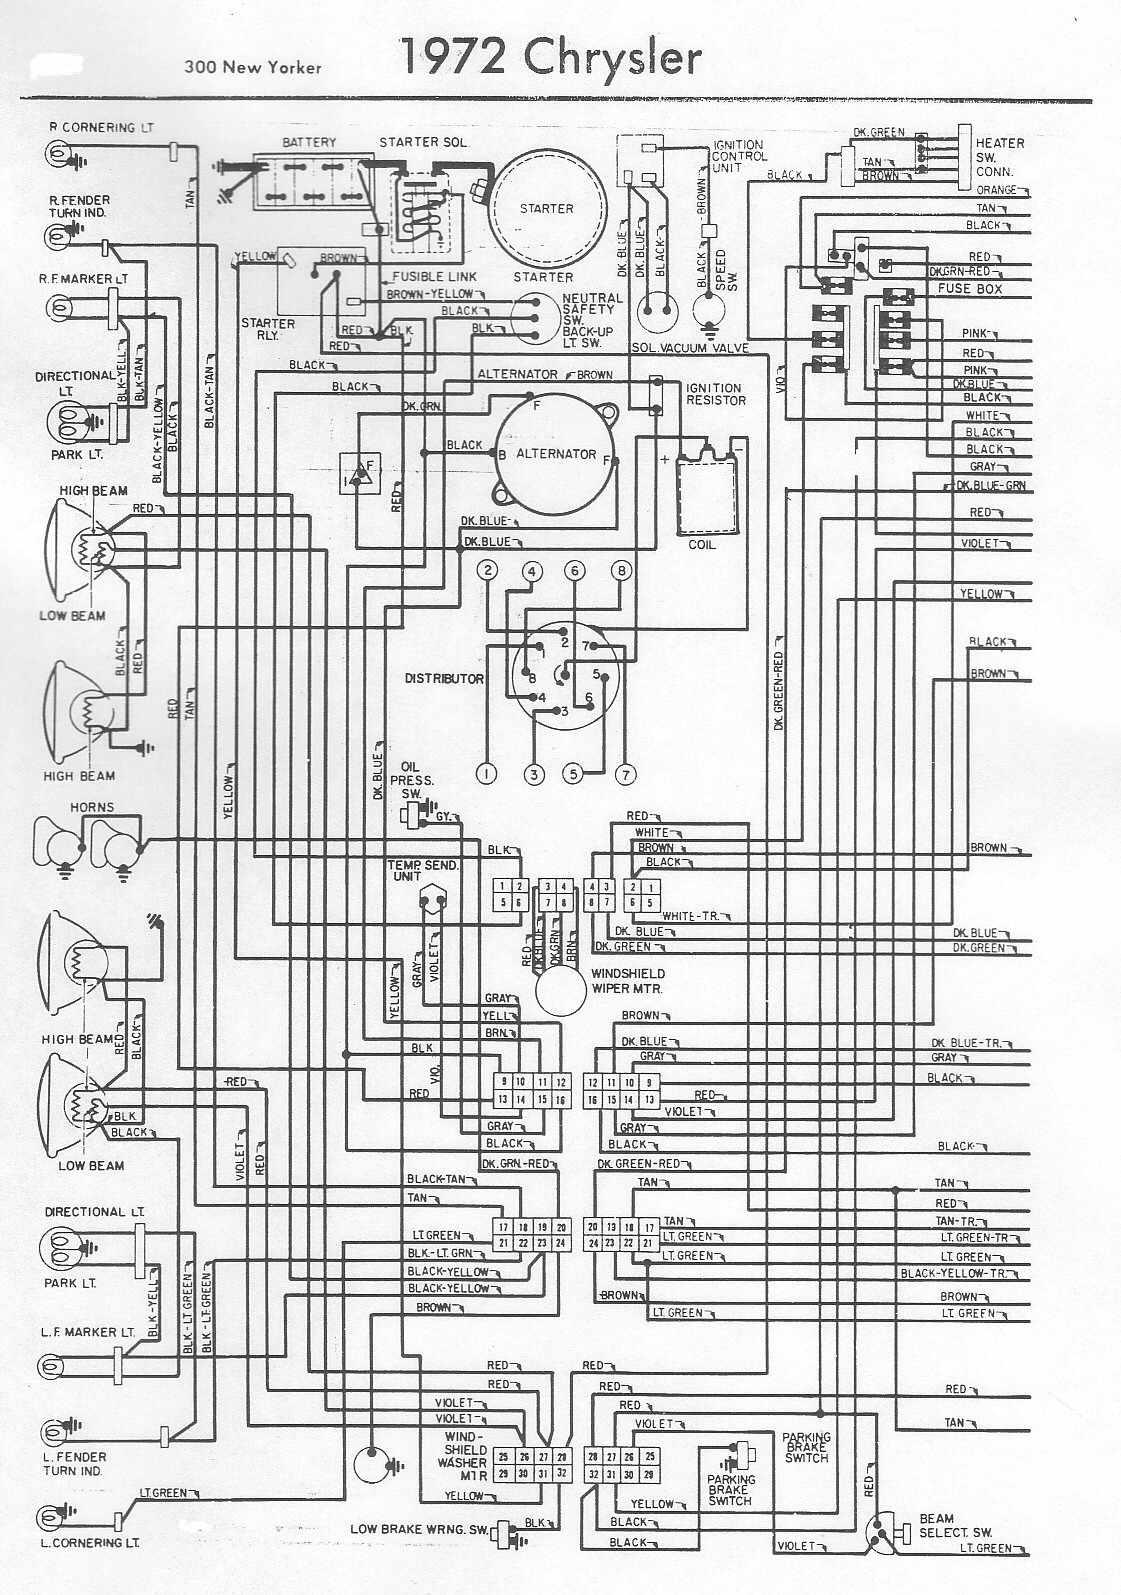 small resolution of 2002 cadillac deville wiring harness wiring library2000 cadillac eldorado electrical diagrams schematics wiring 2002 cadillac eldorado